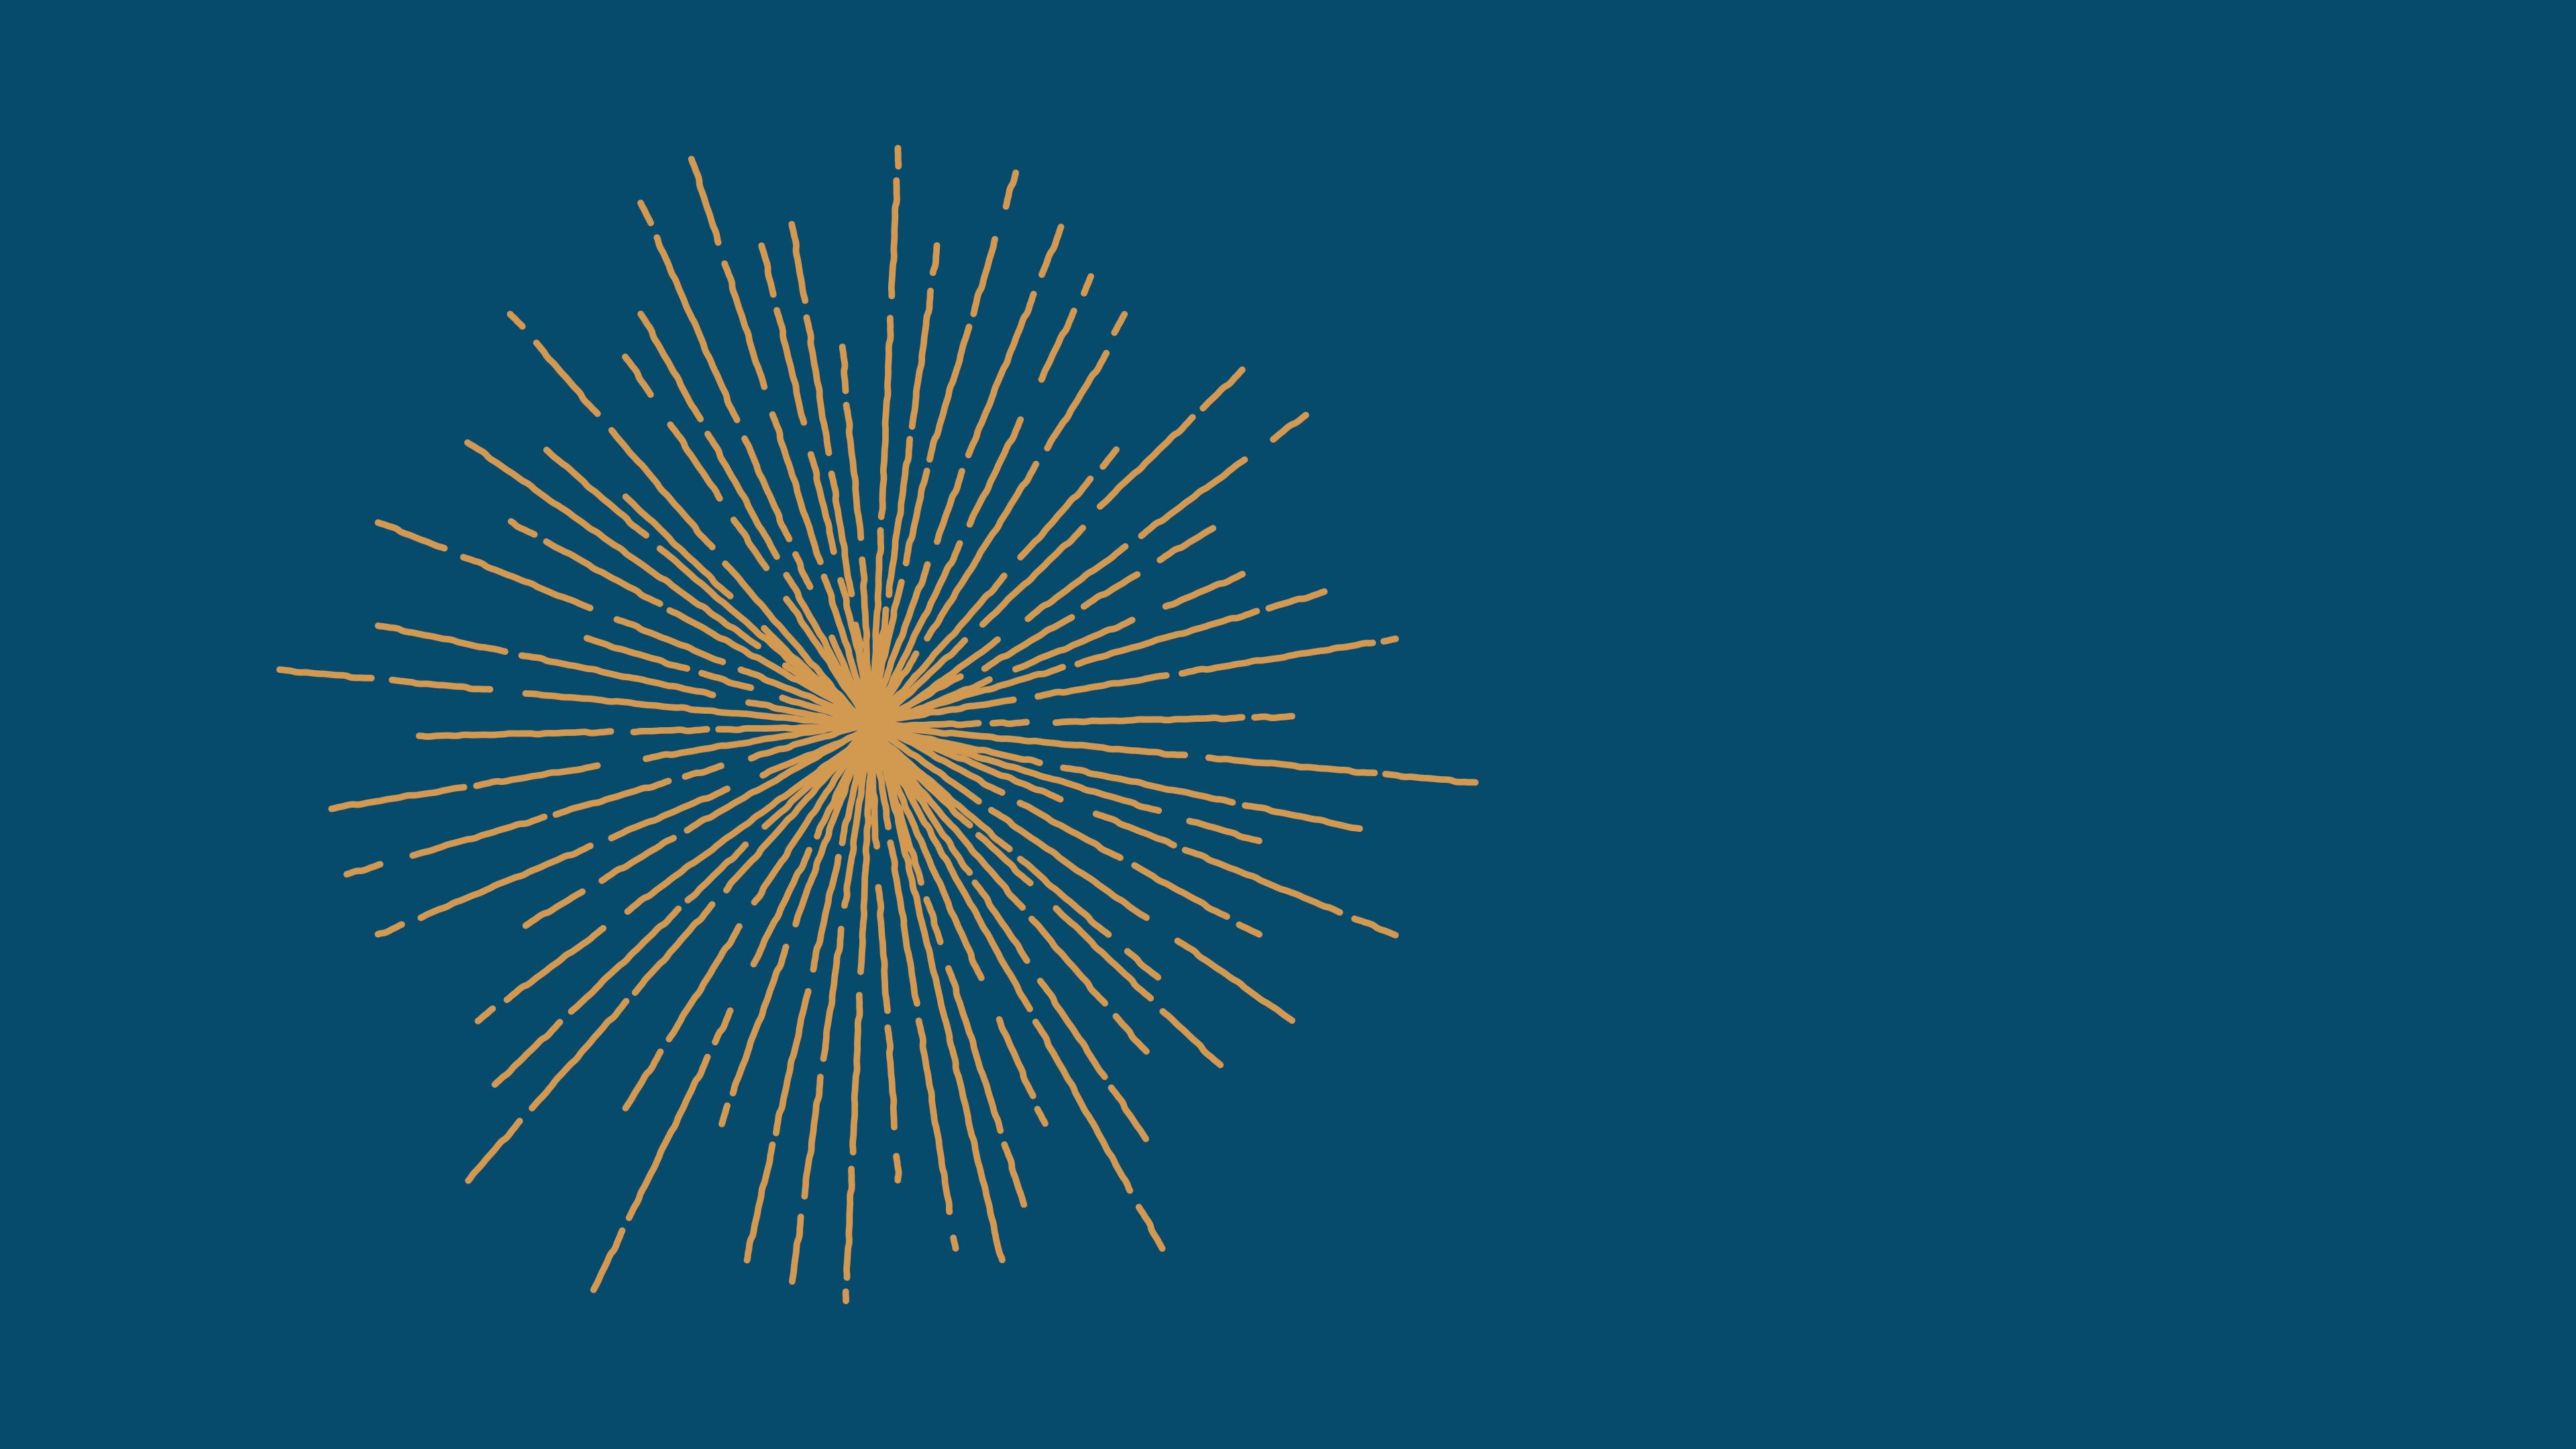 minimalistic starburst wallpaper background 62806